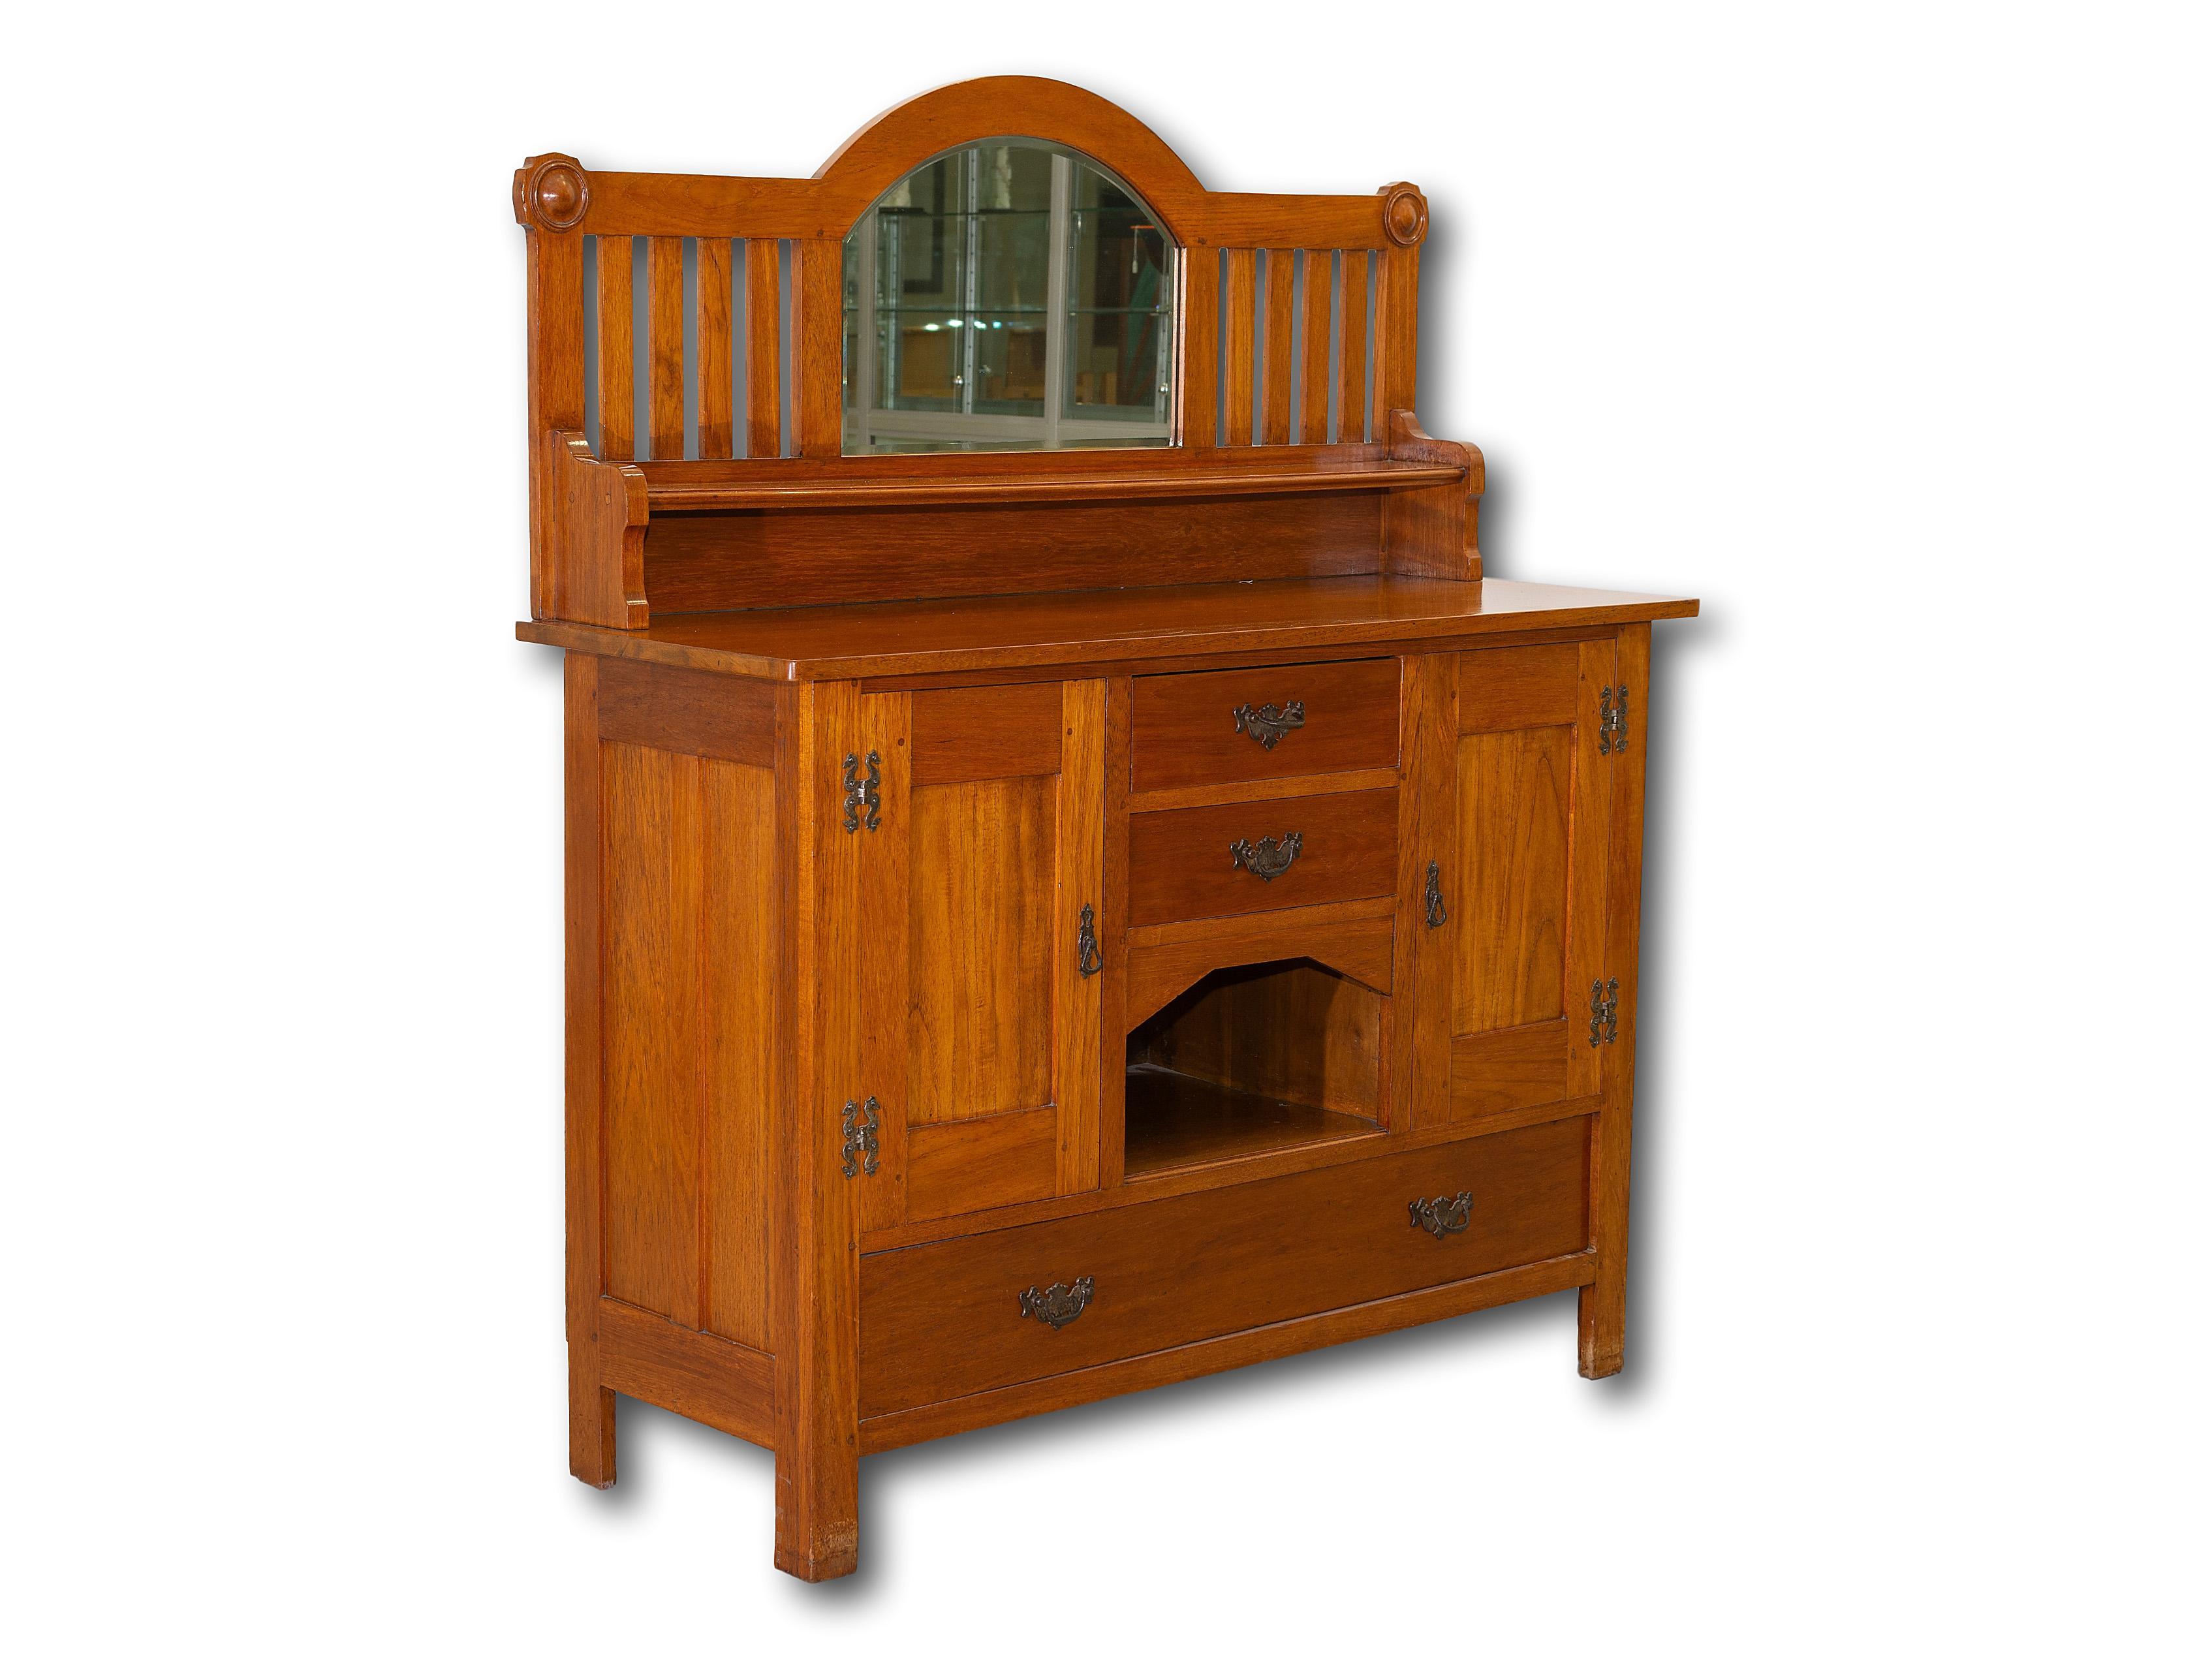 A Mid 20th Century Pine Welsh Dresser, 157 x 137 x 50